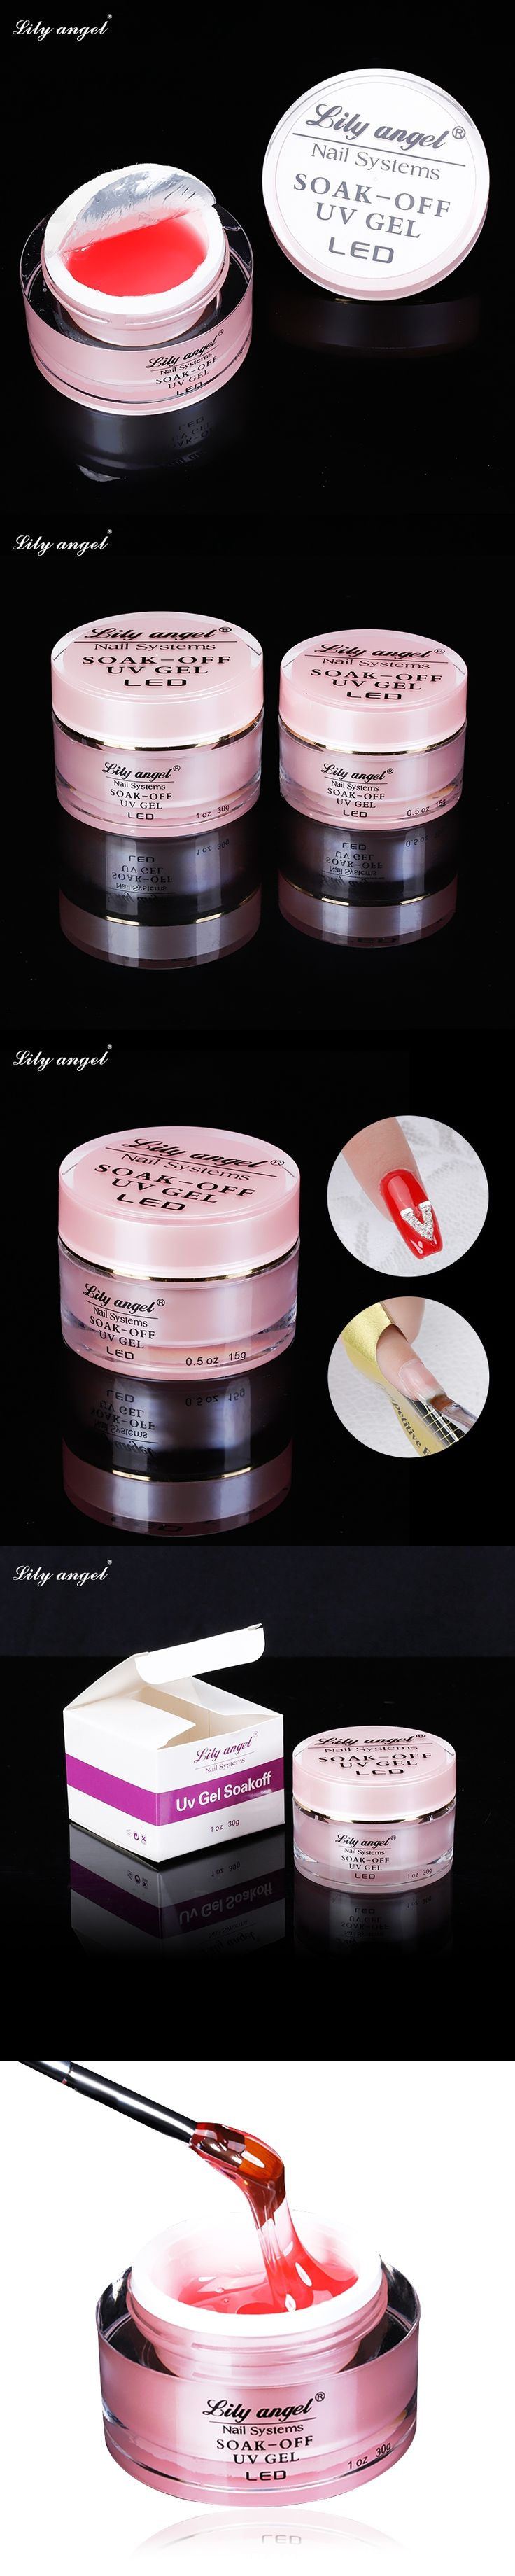 High Quality 15/30g UV Gel LED Lamp Dry Fast Soak Off Pink /Transparent Nail Gel Polish Nails Extension Nail Art Gel Varnishes